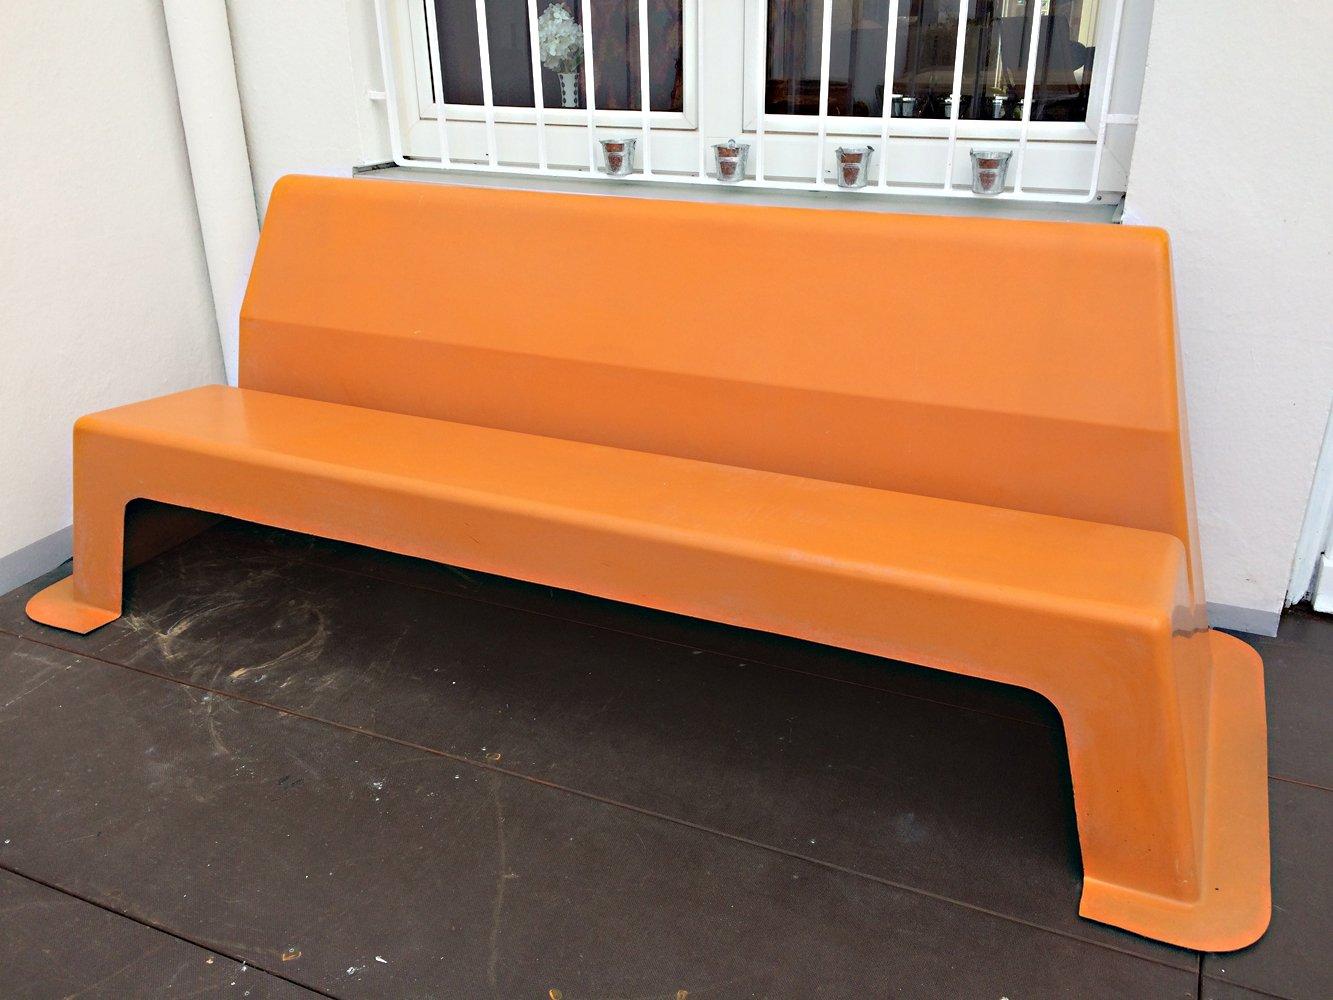 Fiberglass Garden Bench : Vintage orange fiberglass bench for sale at pamono